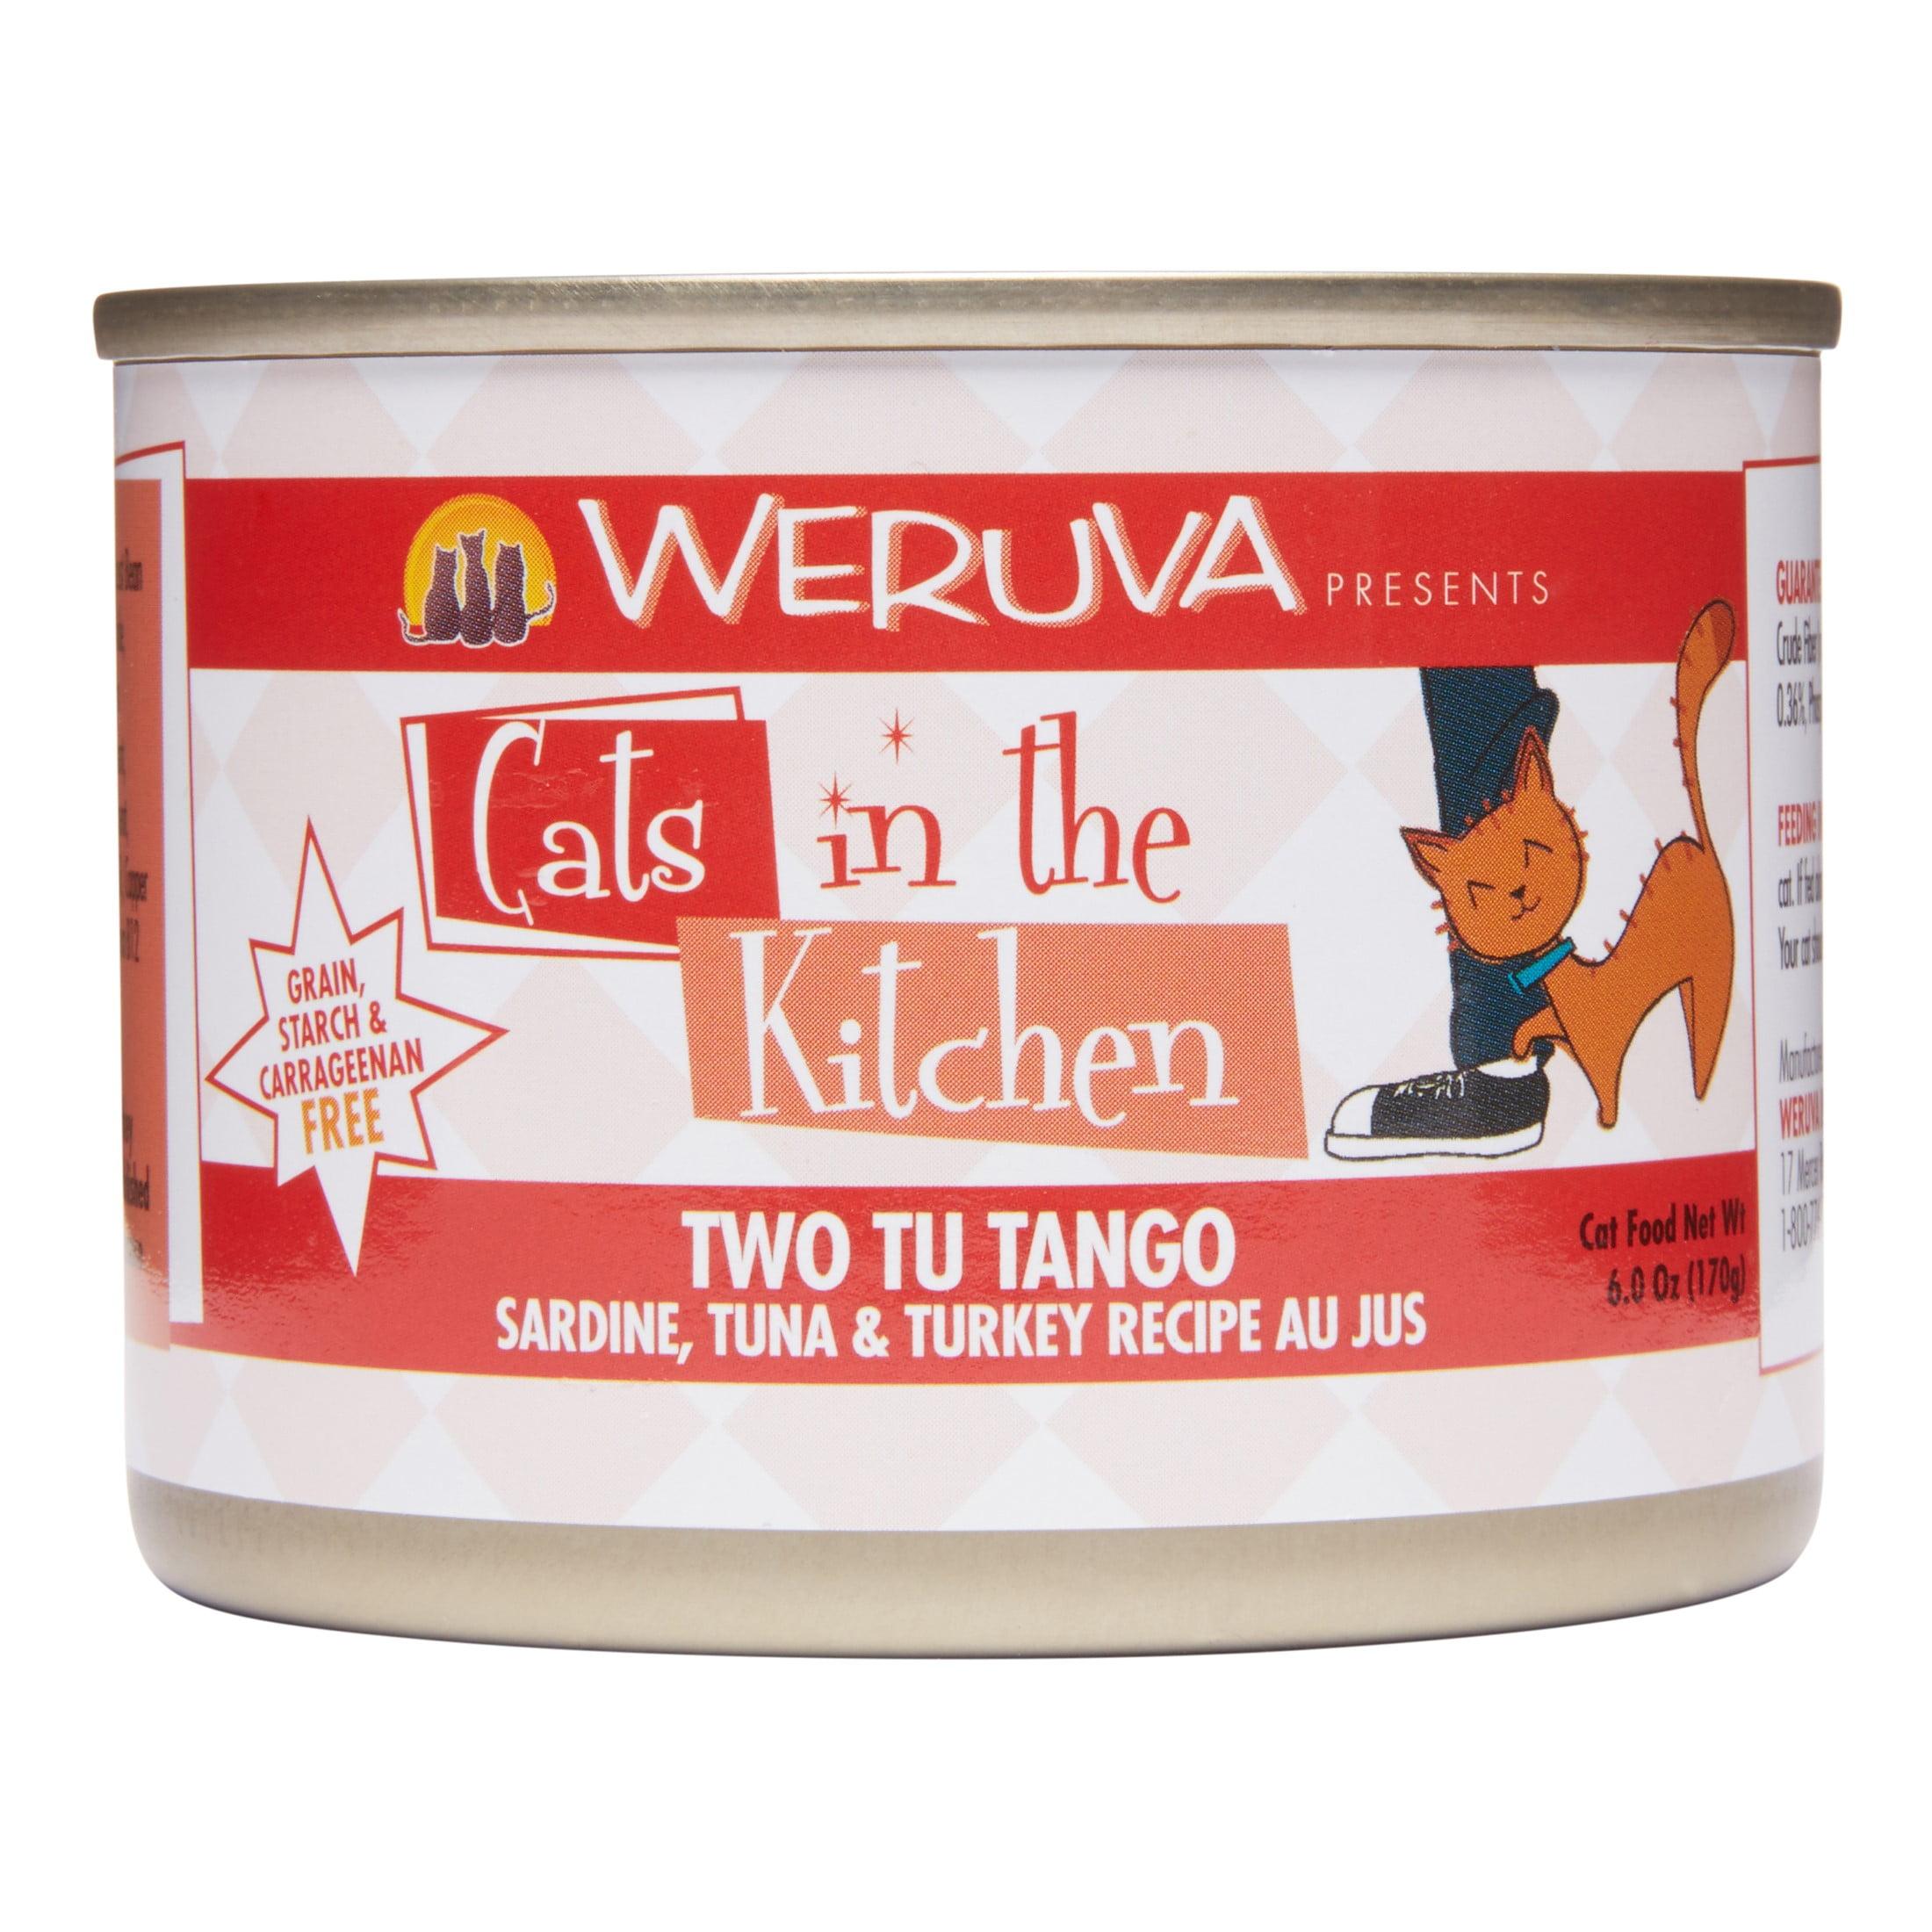 Weruva Cats in the Kitchen Grain-Free Two Tu Tango Sardine, Tuna & Turkey Recipe Wet Cat Food, 6 Oz, Pack of 24